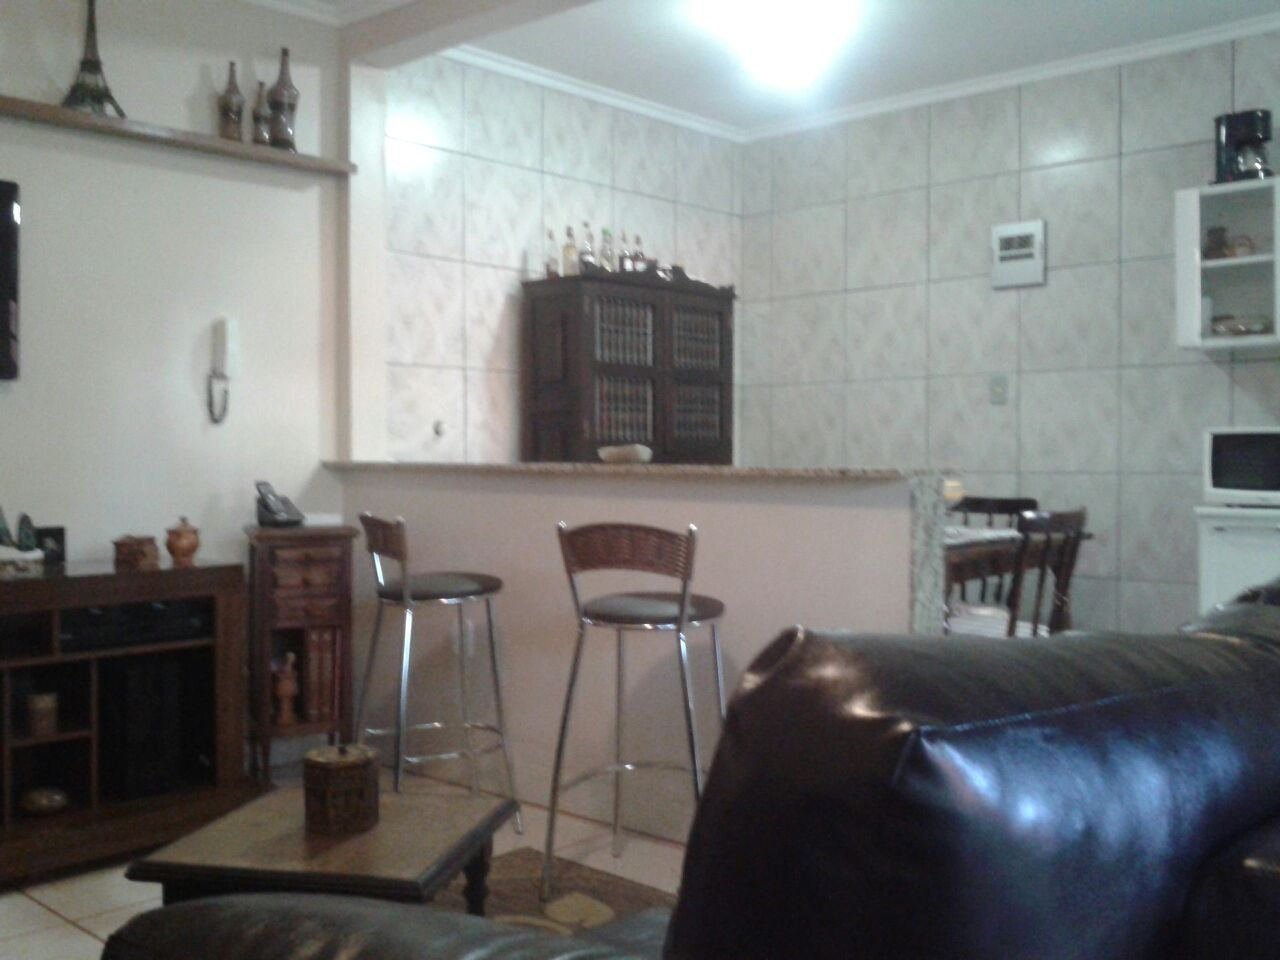 Patricia Fidelis Decora O Projeto Ampliando Sala De Estar -> Fotos De Cozinha Conceito Aberto